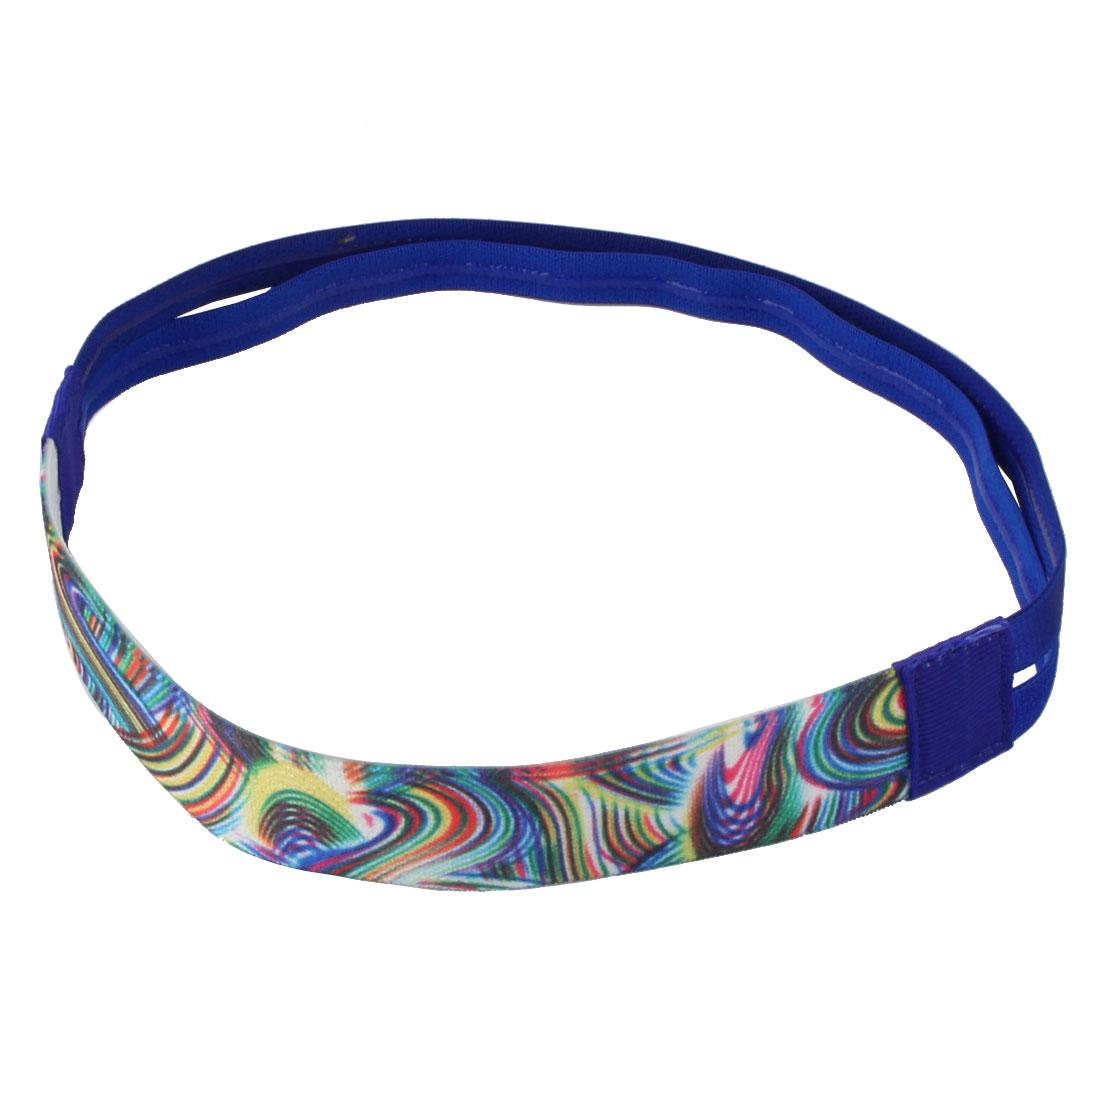 Exercise Silicone Double Line Design Non-slip Sports Headband Headwrap Dark Blue